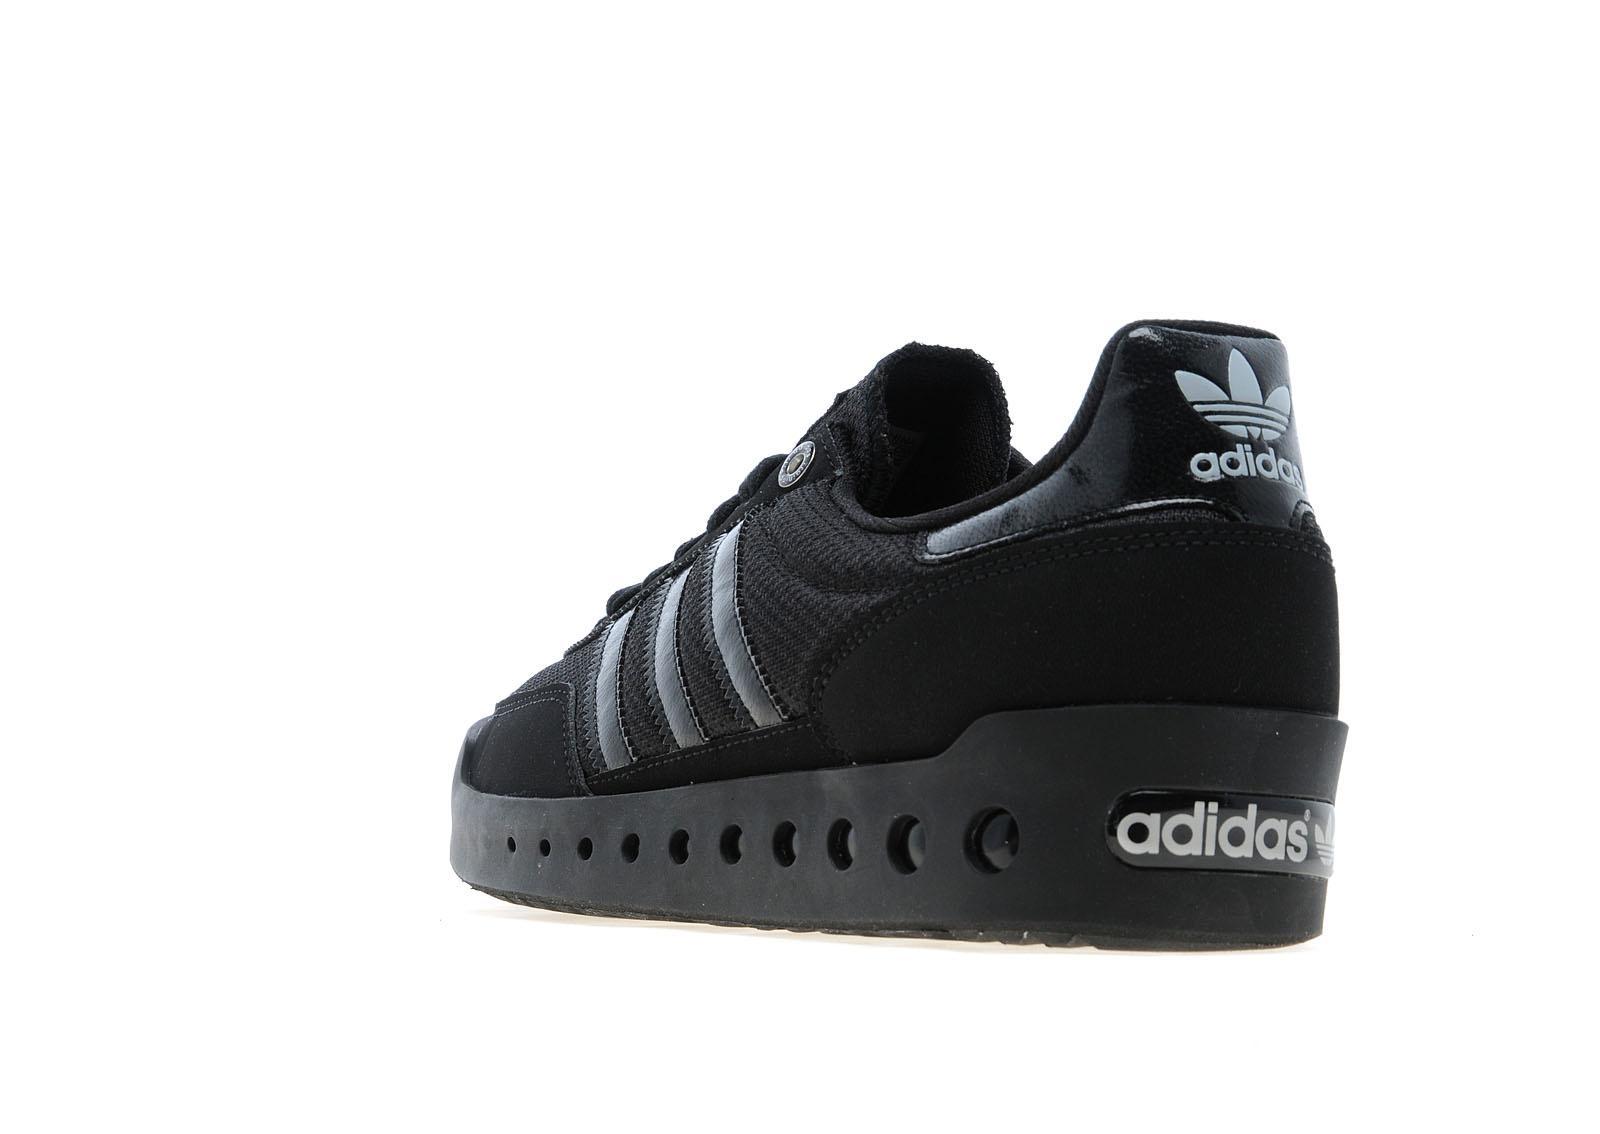 adidas high tops jd